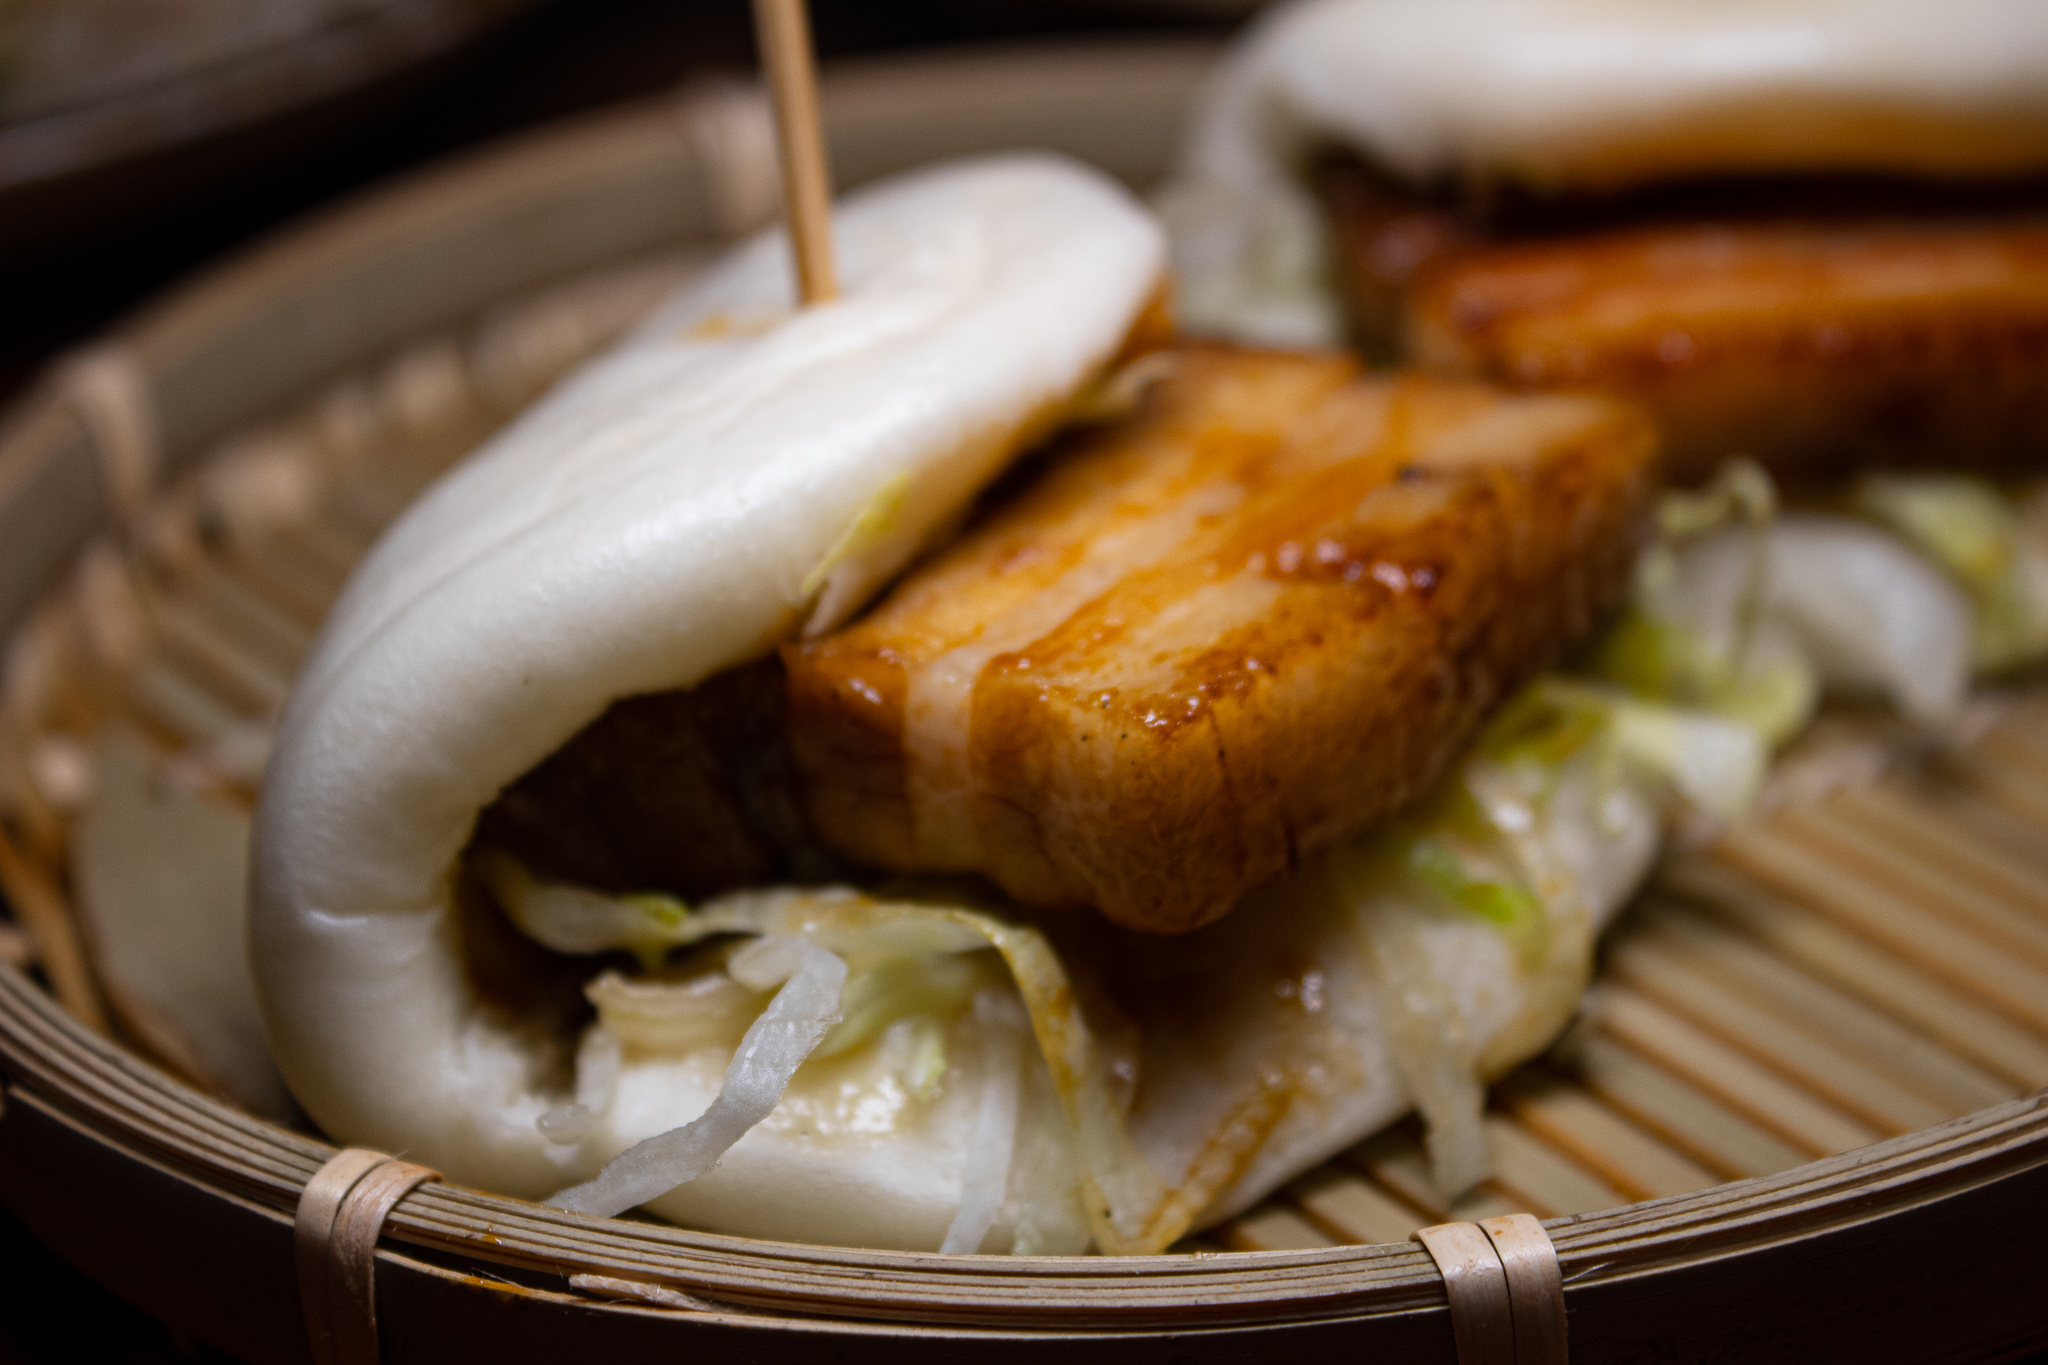 Pork Bun - soy glazed pork belly, pickled vegetables, mustard seeds, bean paste aioli